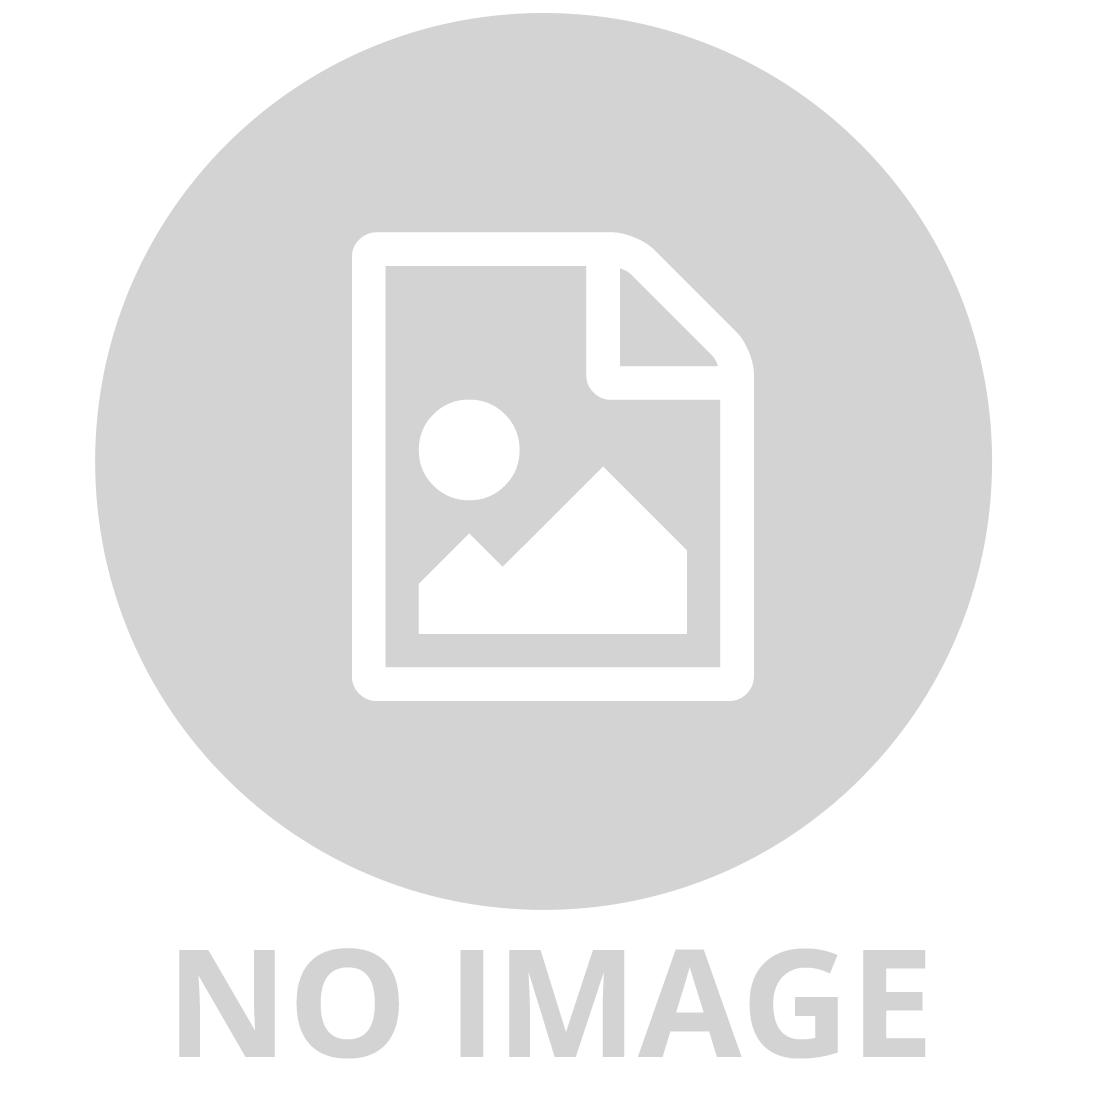 BRIO WORLD MECHANICAL TURNTABLE